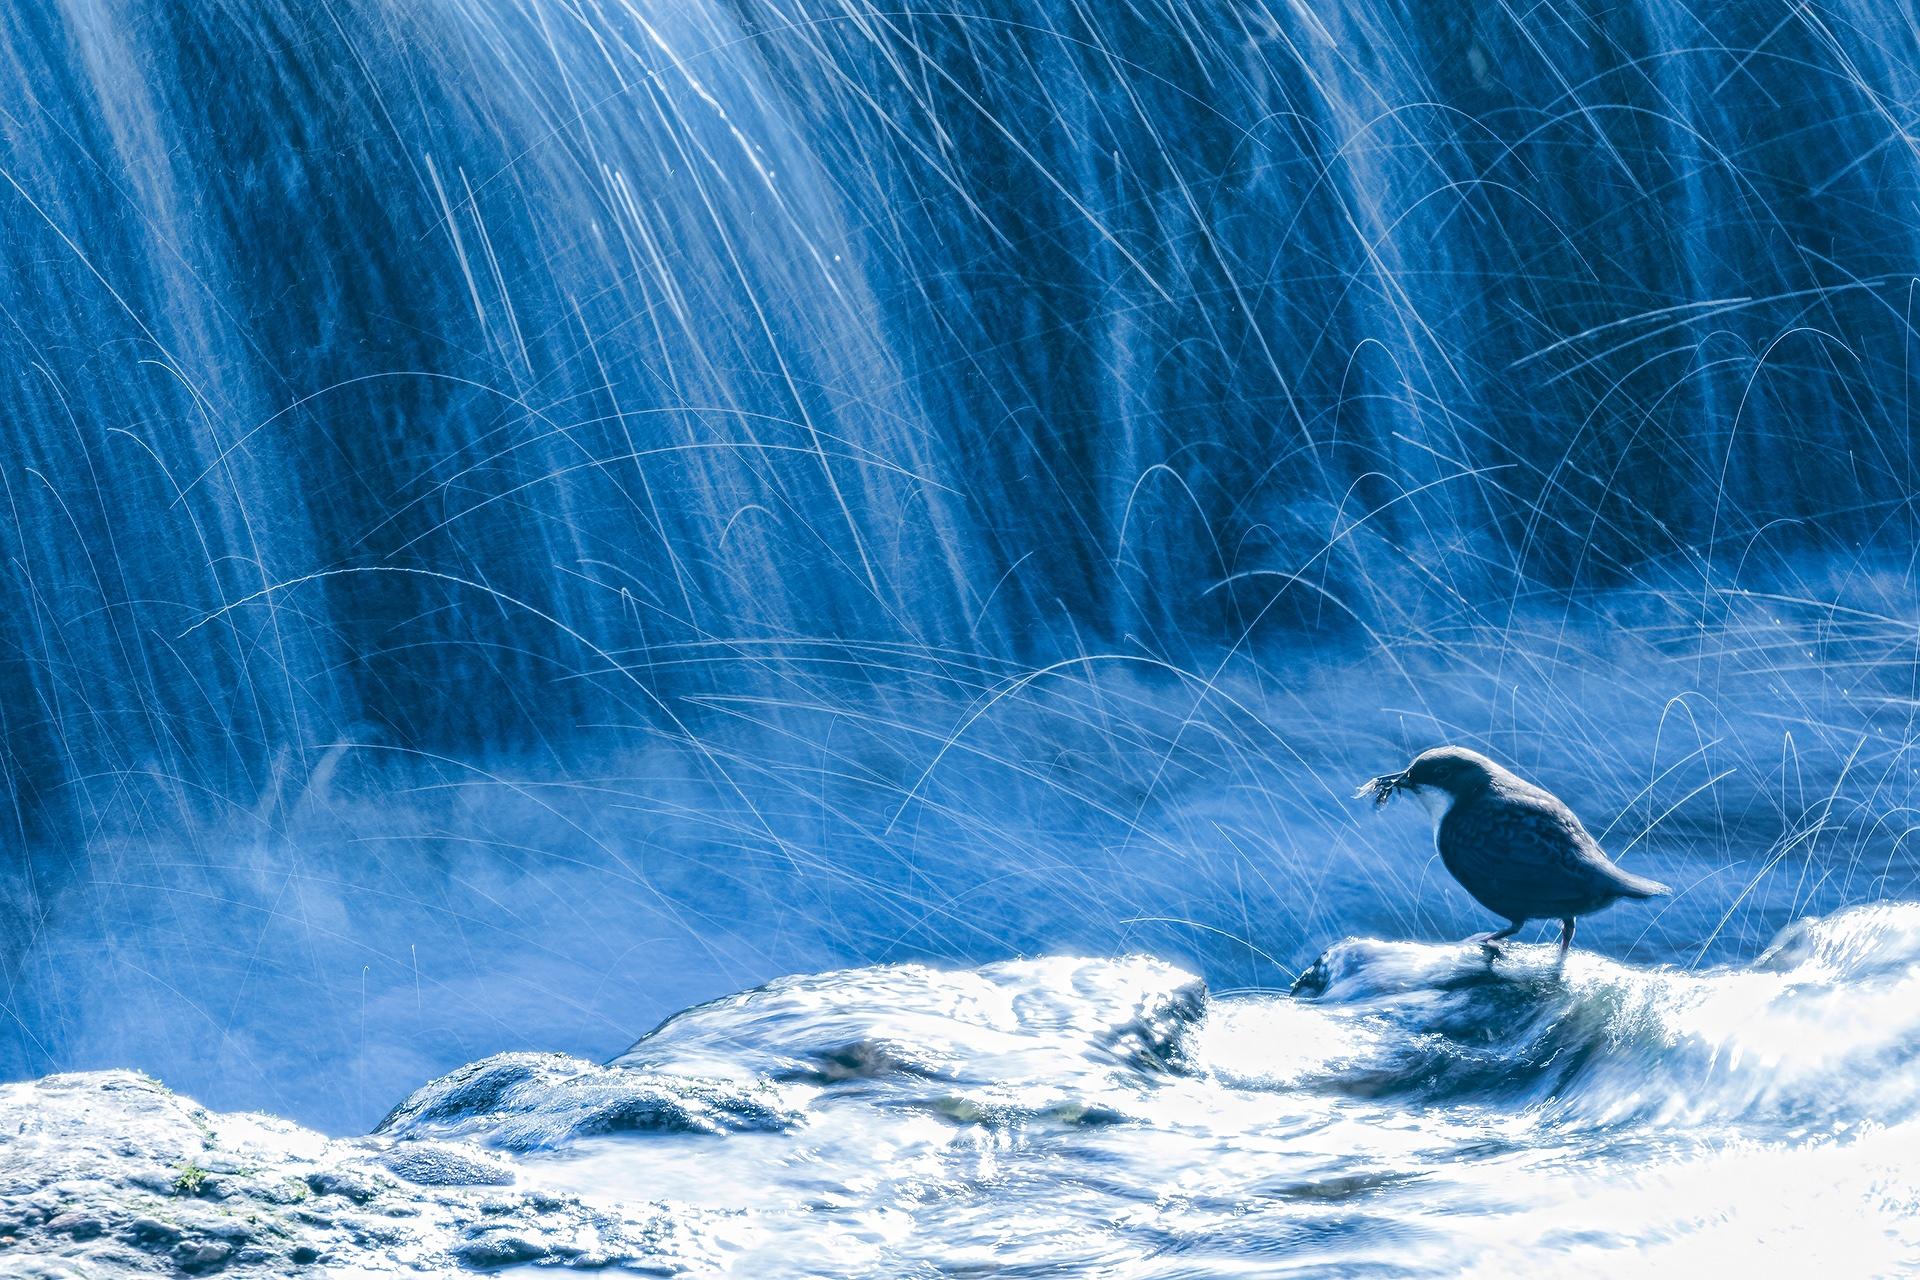 Water bird - Mario Suarez - Portfolio Natural, Fotografía de Naturaleza de Autor